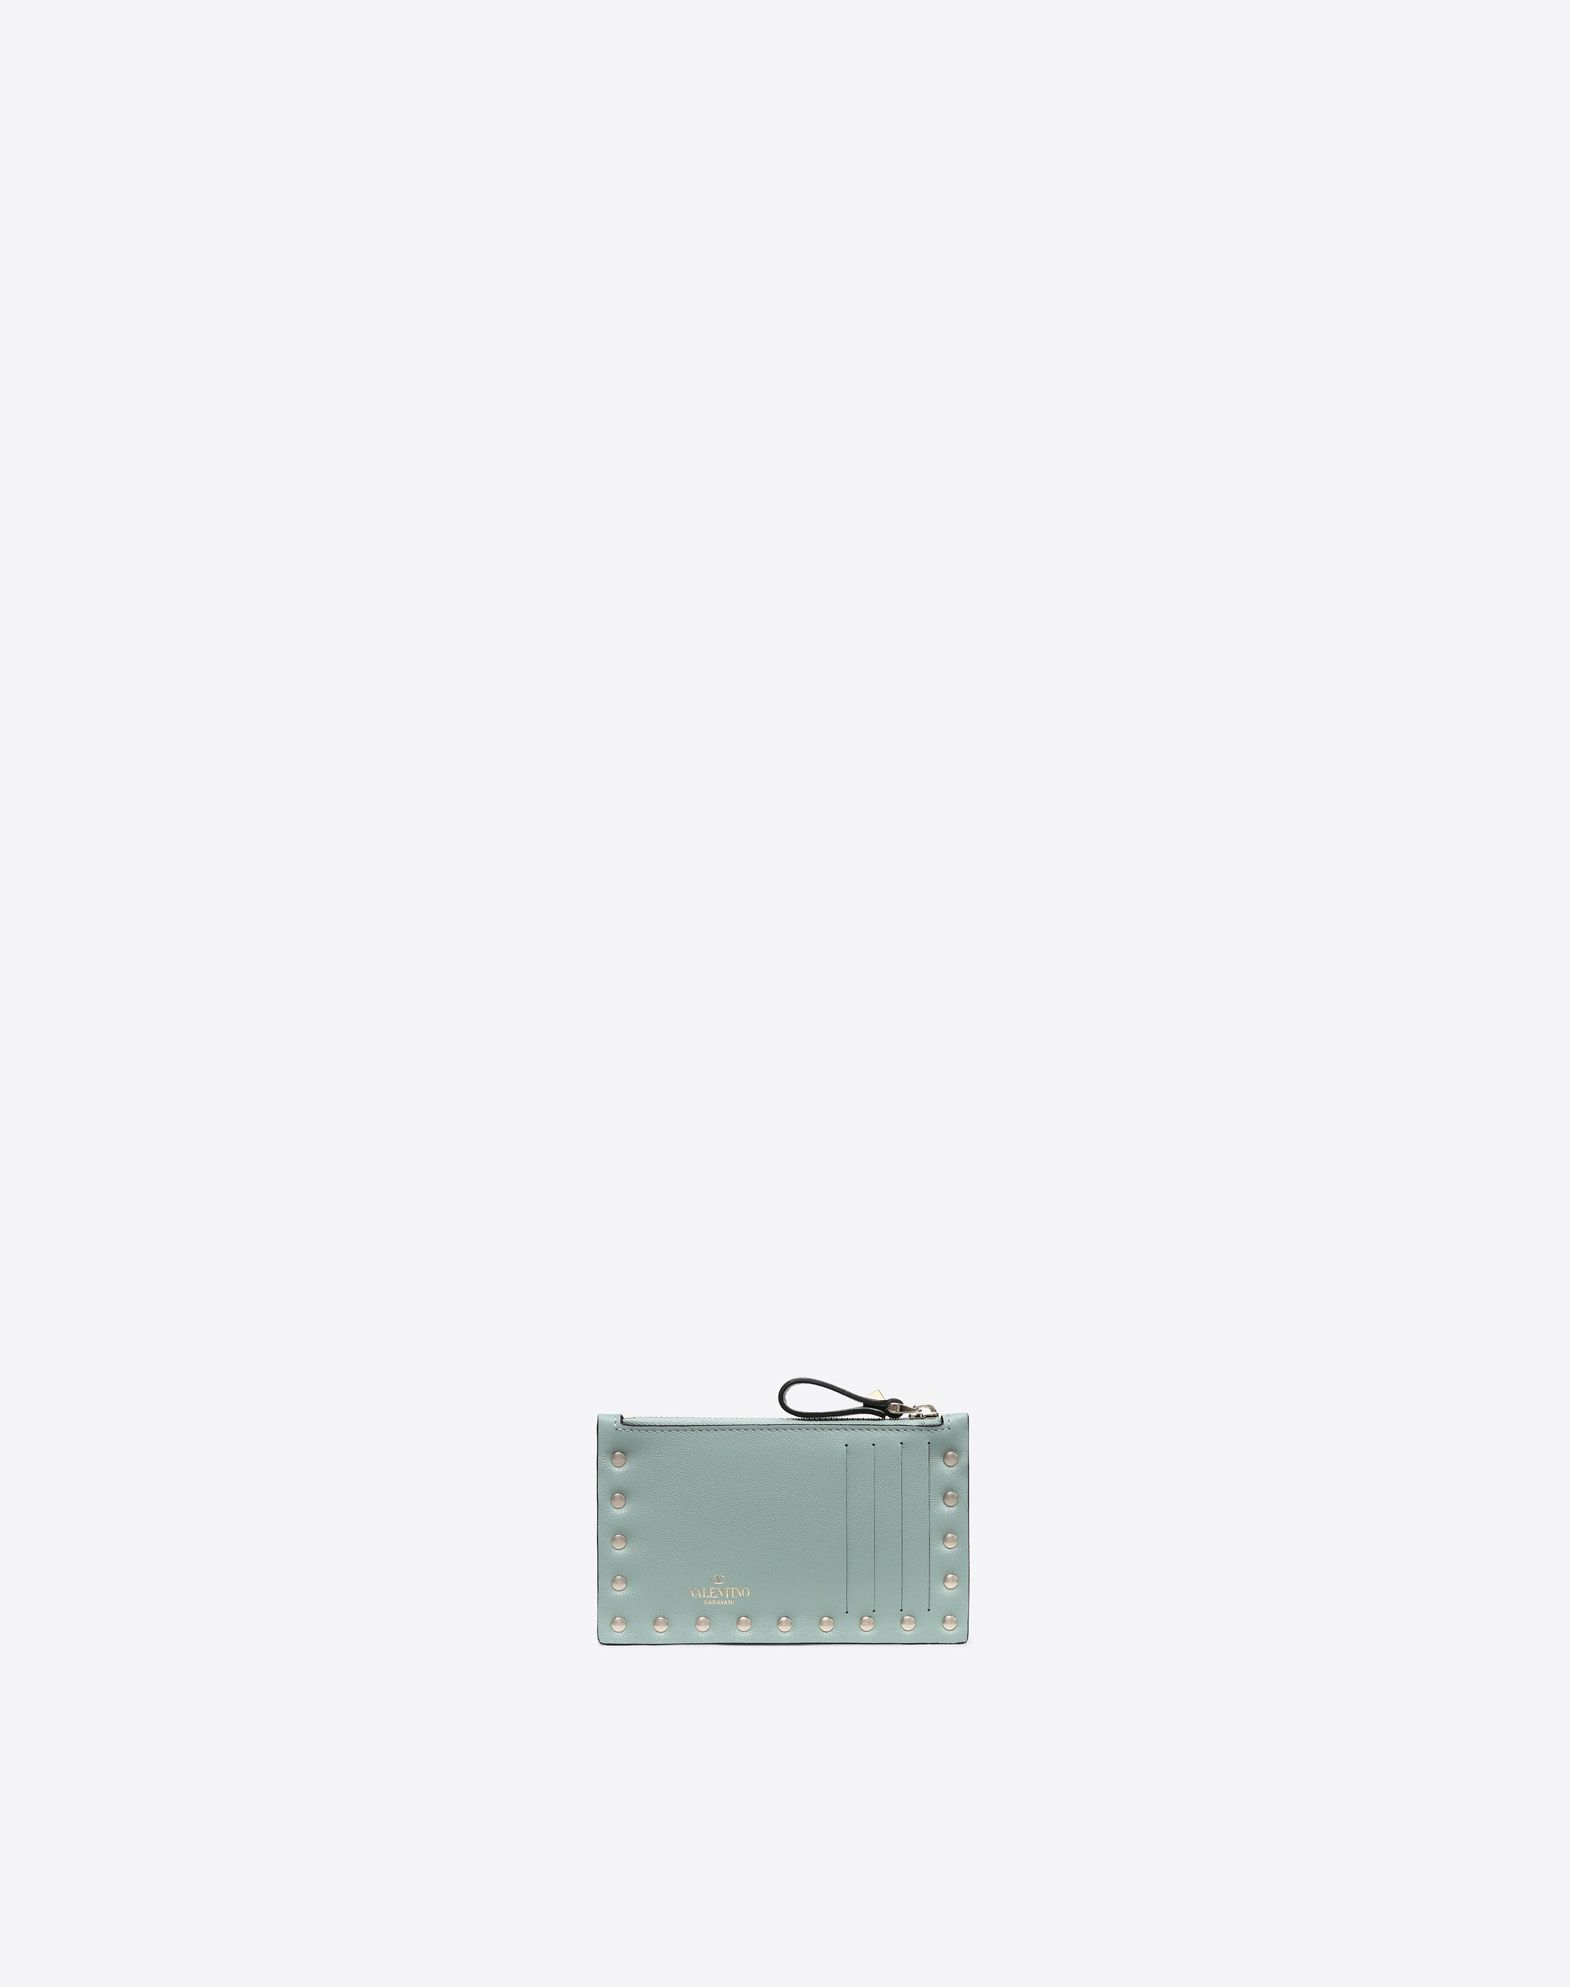 VALENTINO GARAVANI Rockstud Coin Purse and Card Case COIN PURSES & CARD CASES D d